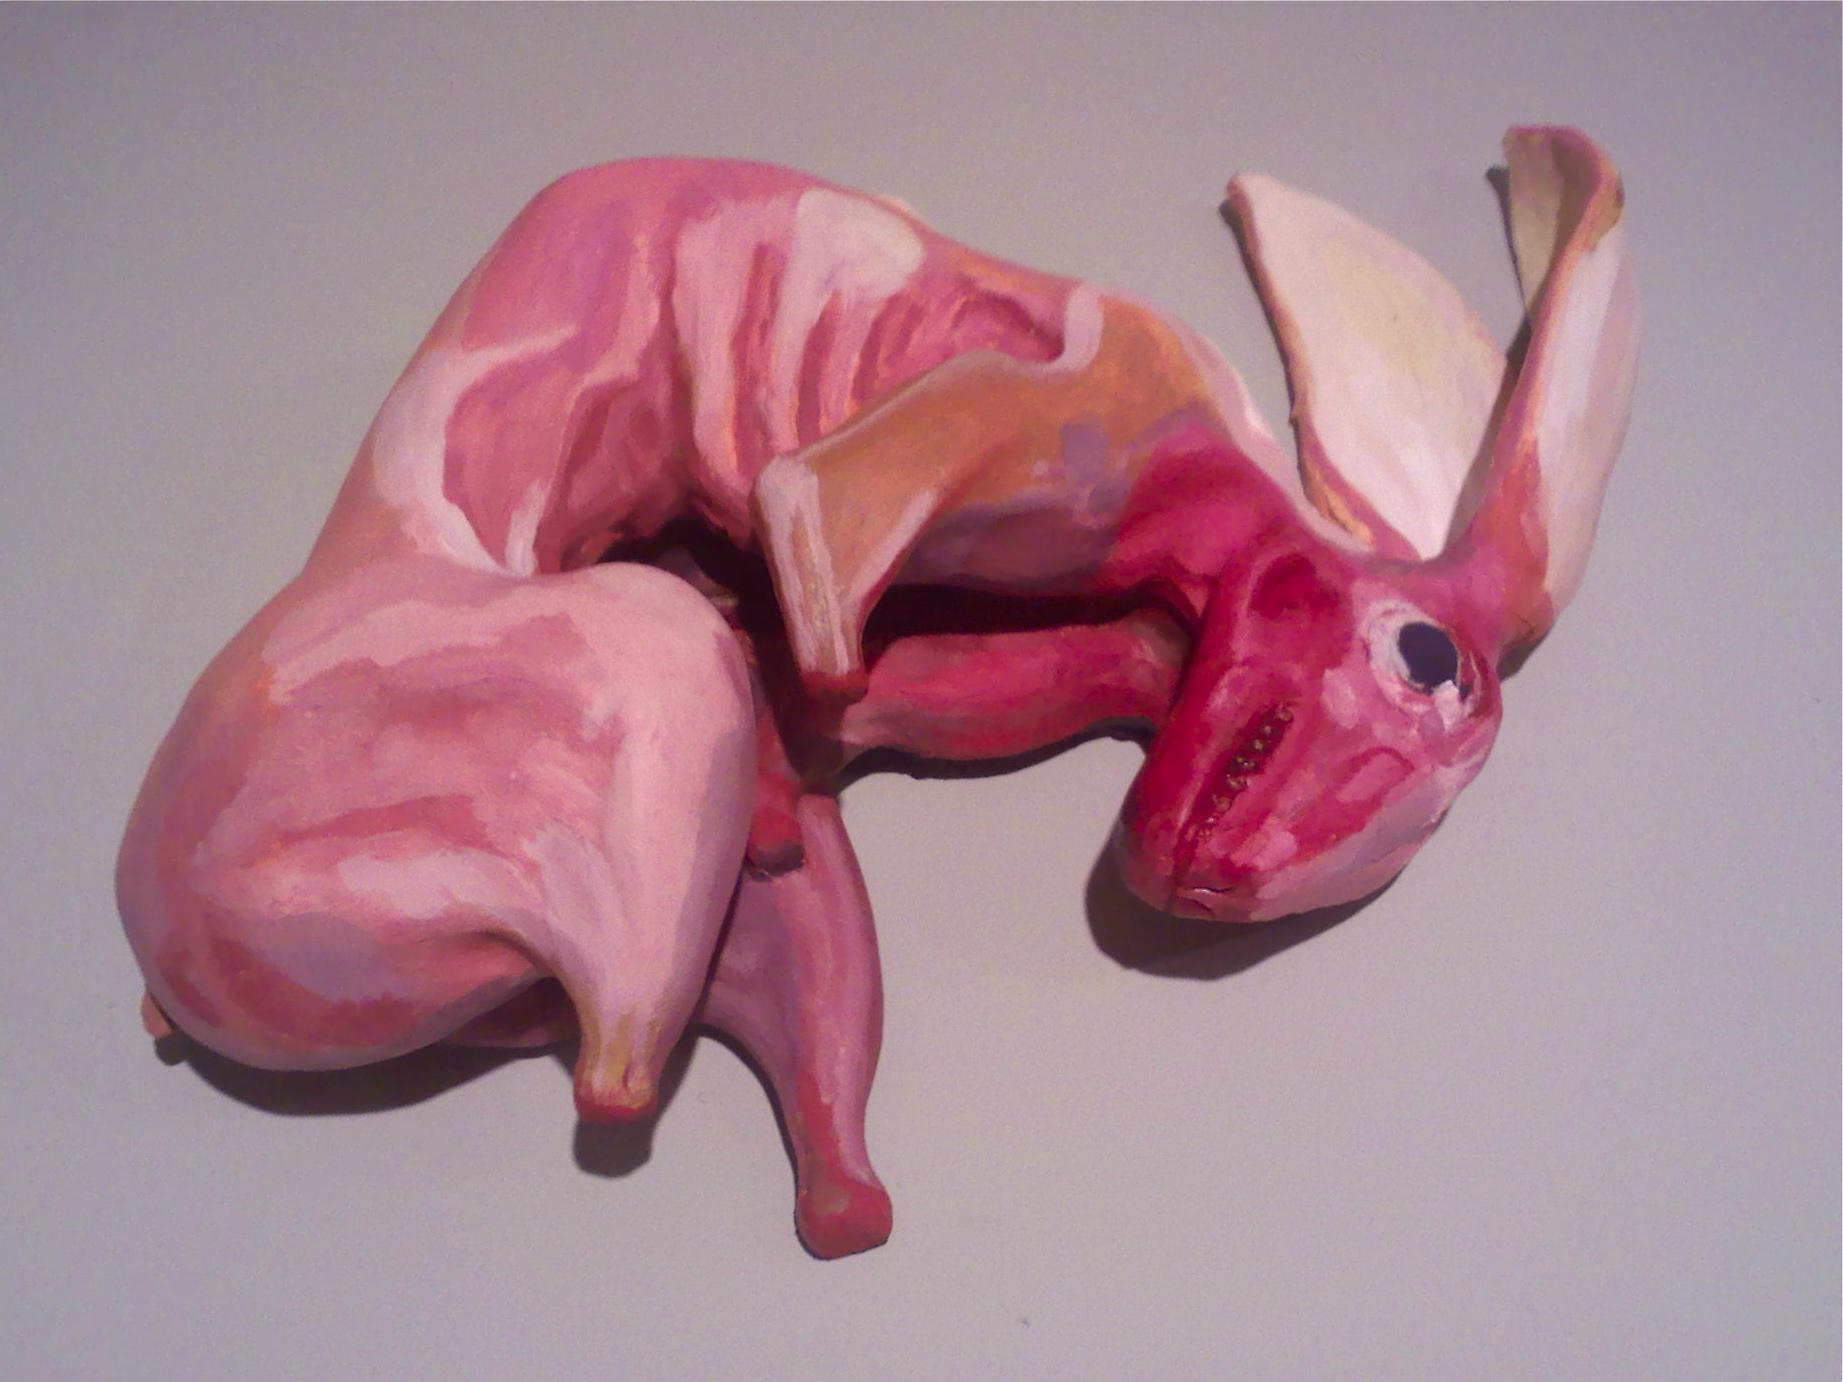 Raw Rabbit II